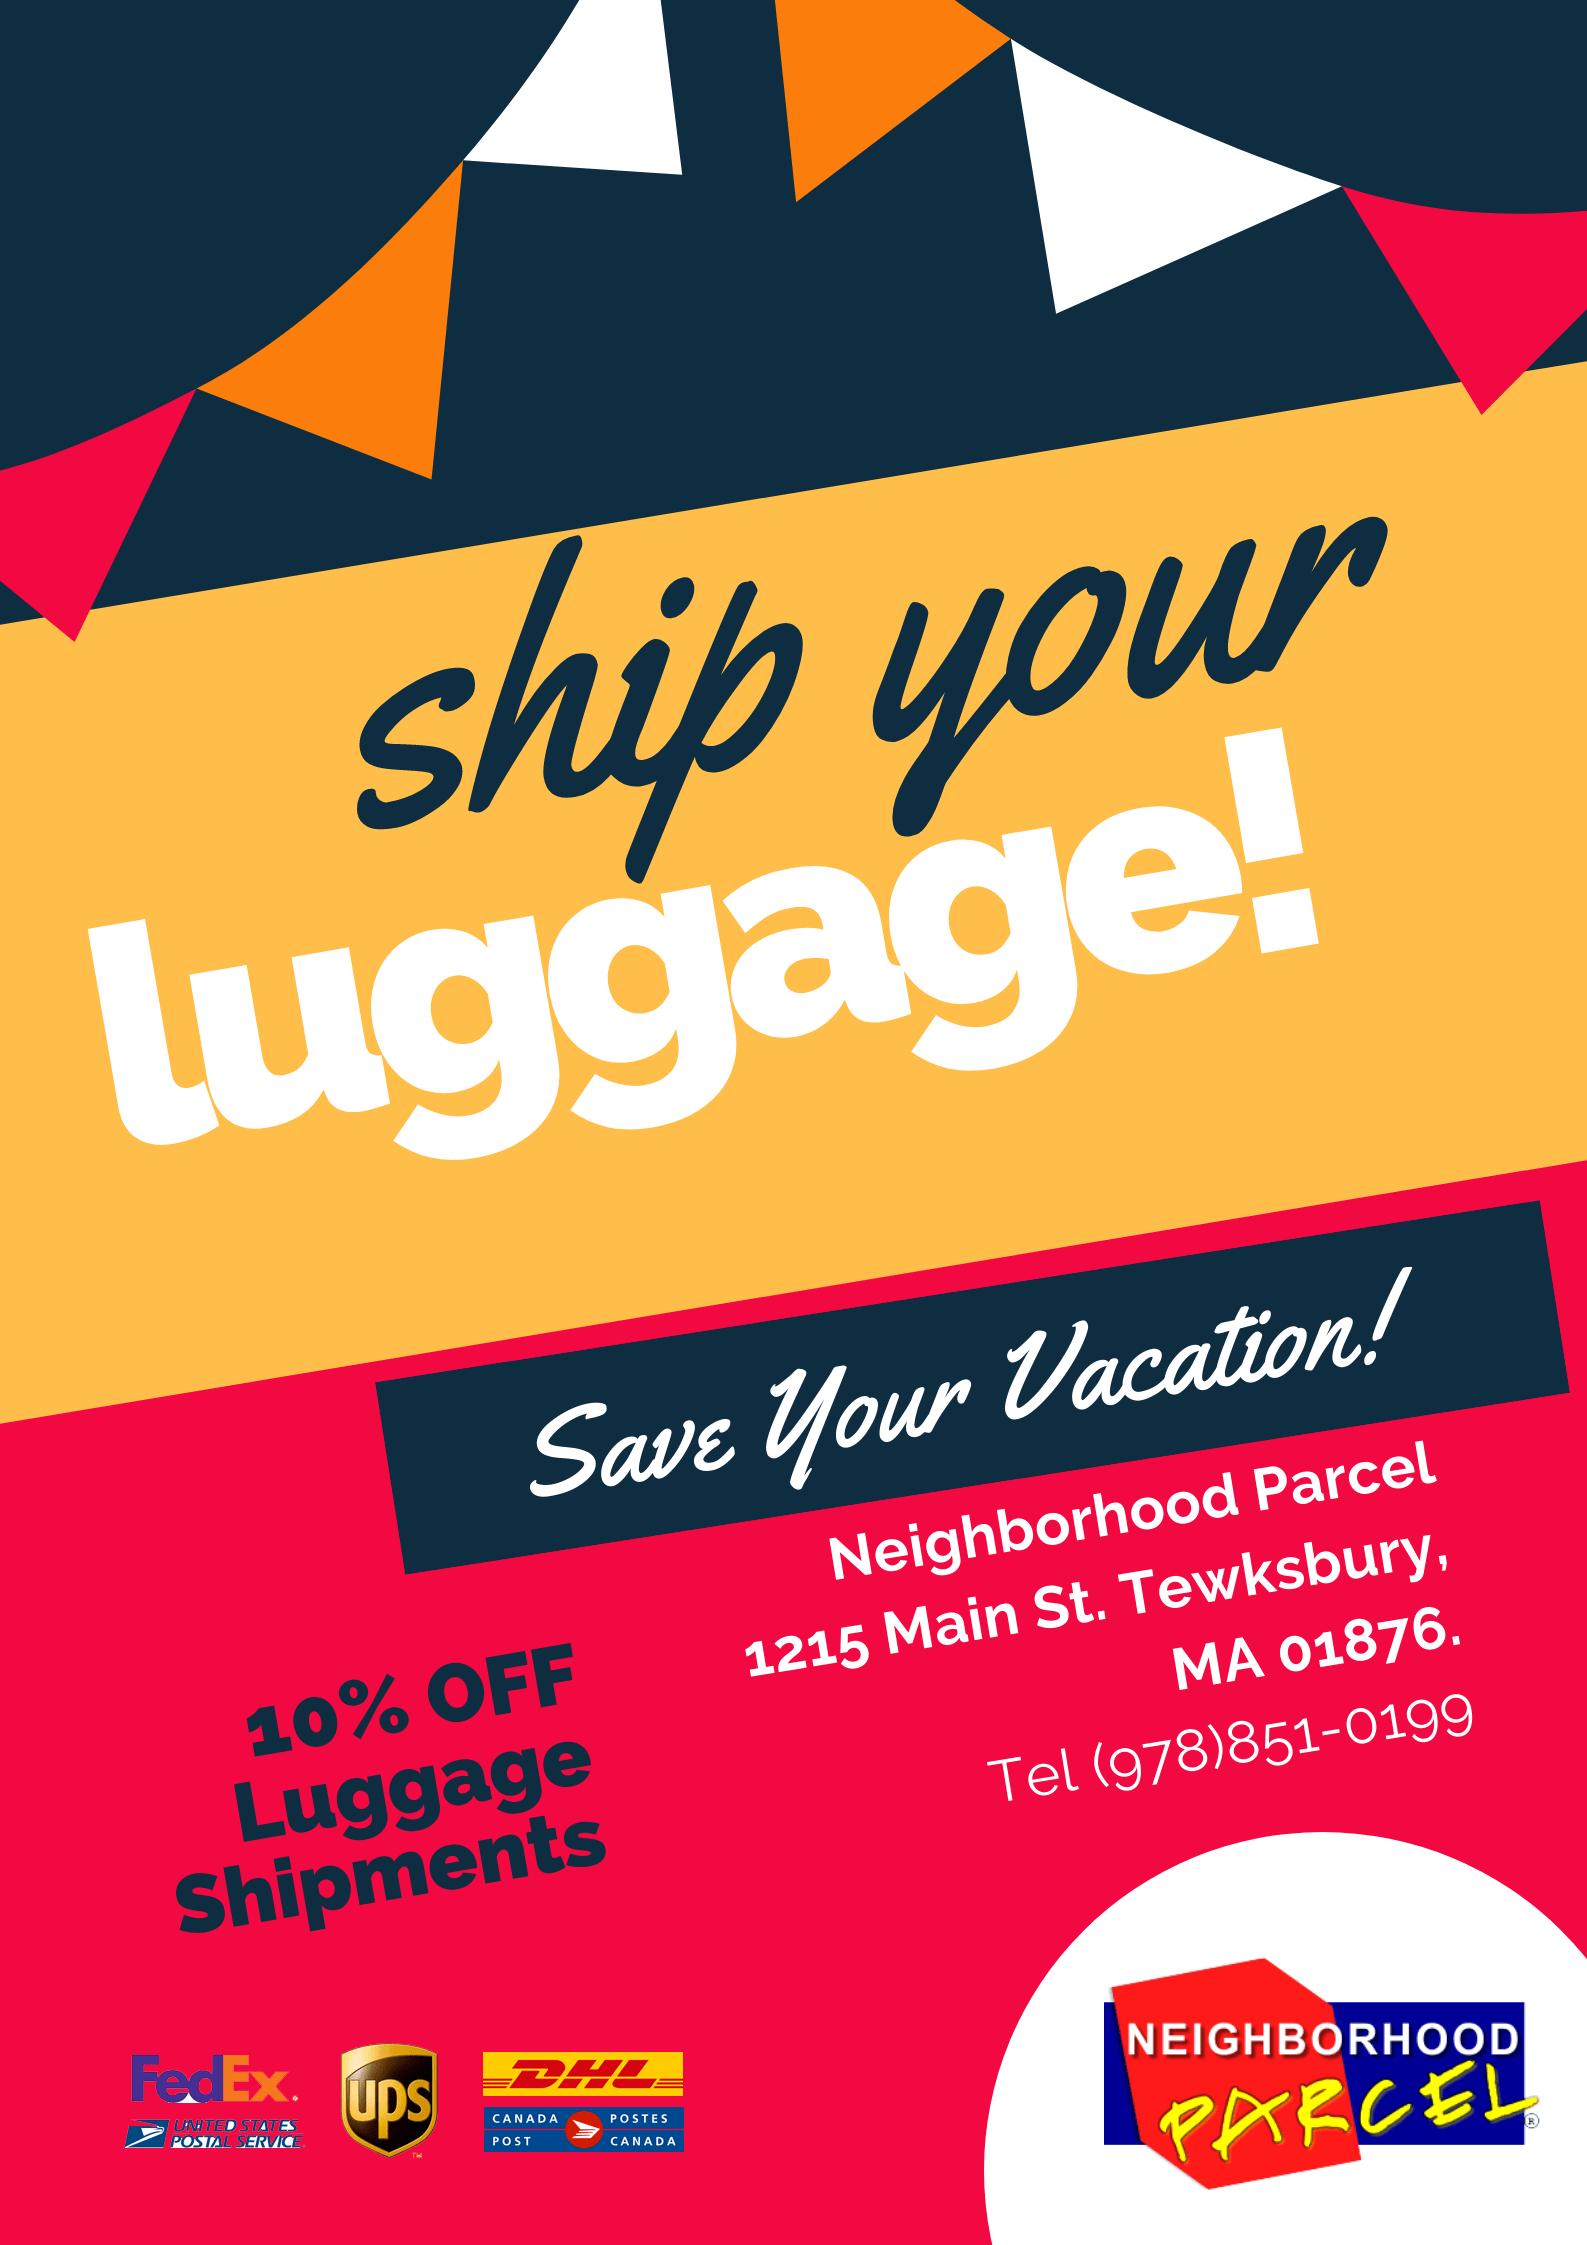 Luggage shipping service company Near Boston MA